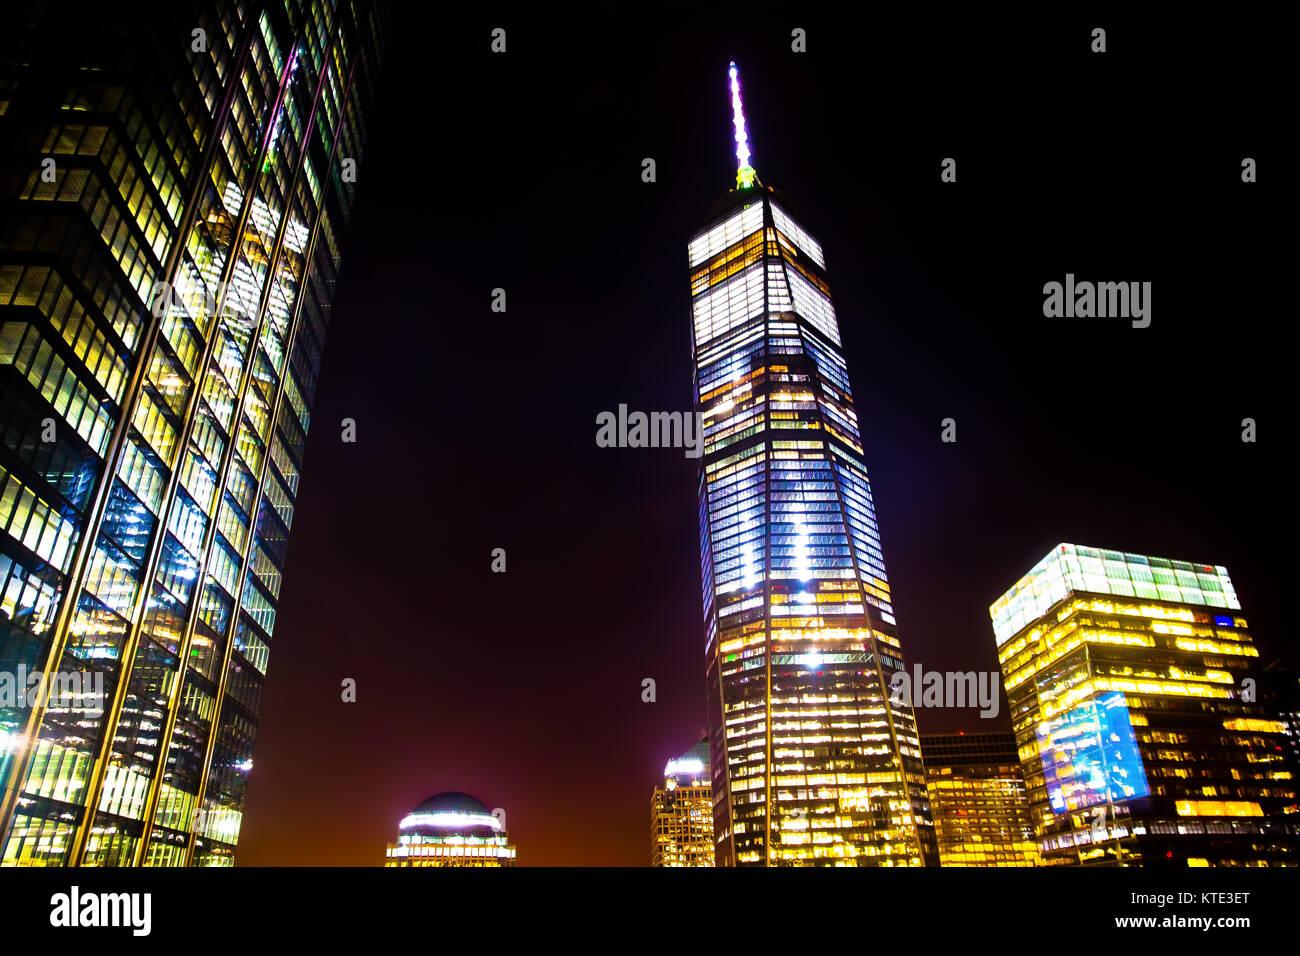 El One World Trade Center Freedom Tower NYC Imagen De Stock